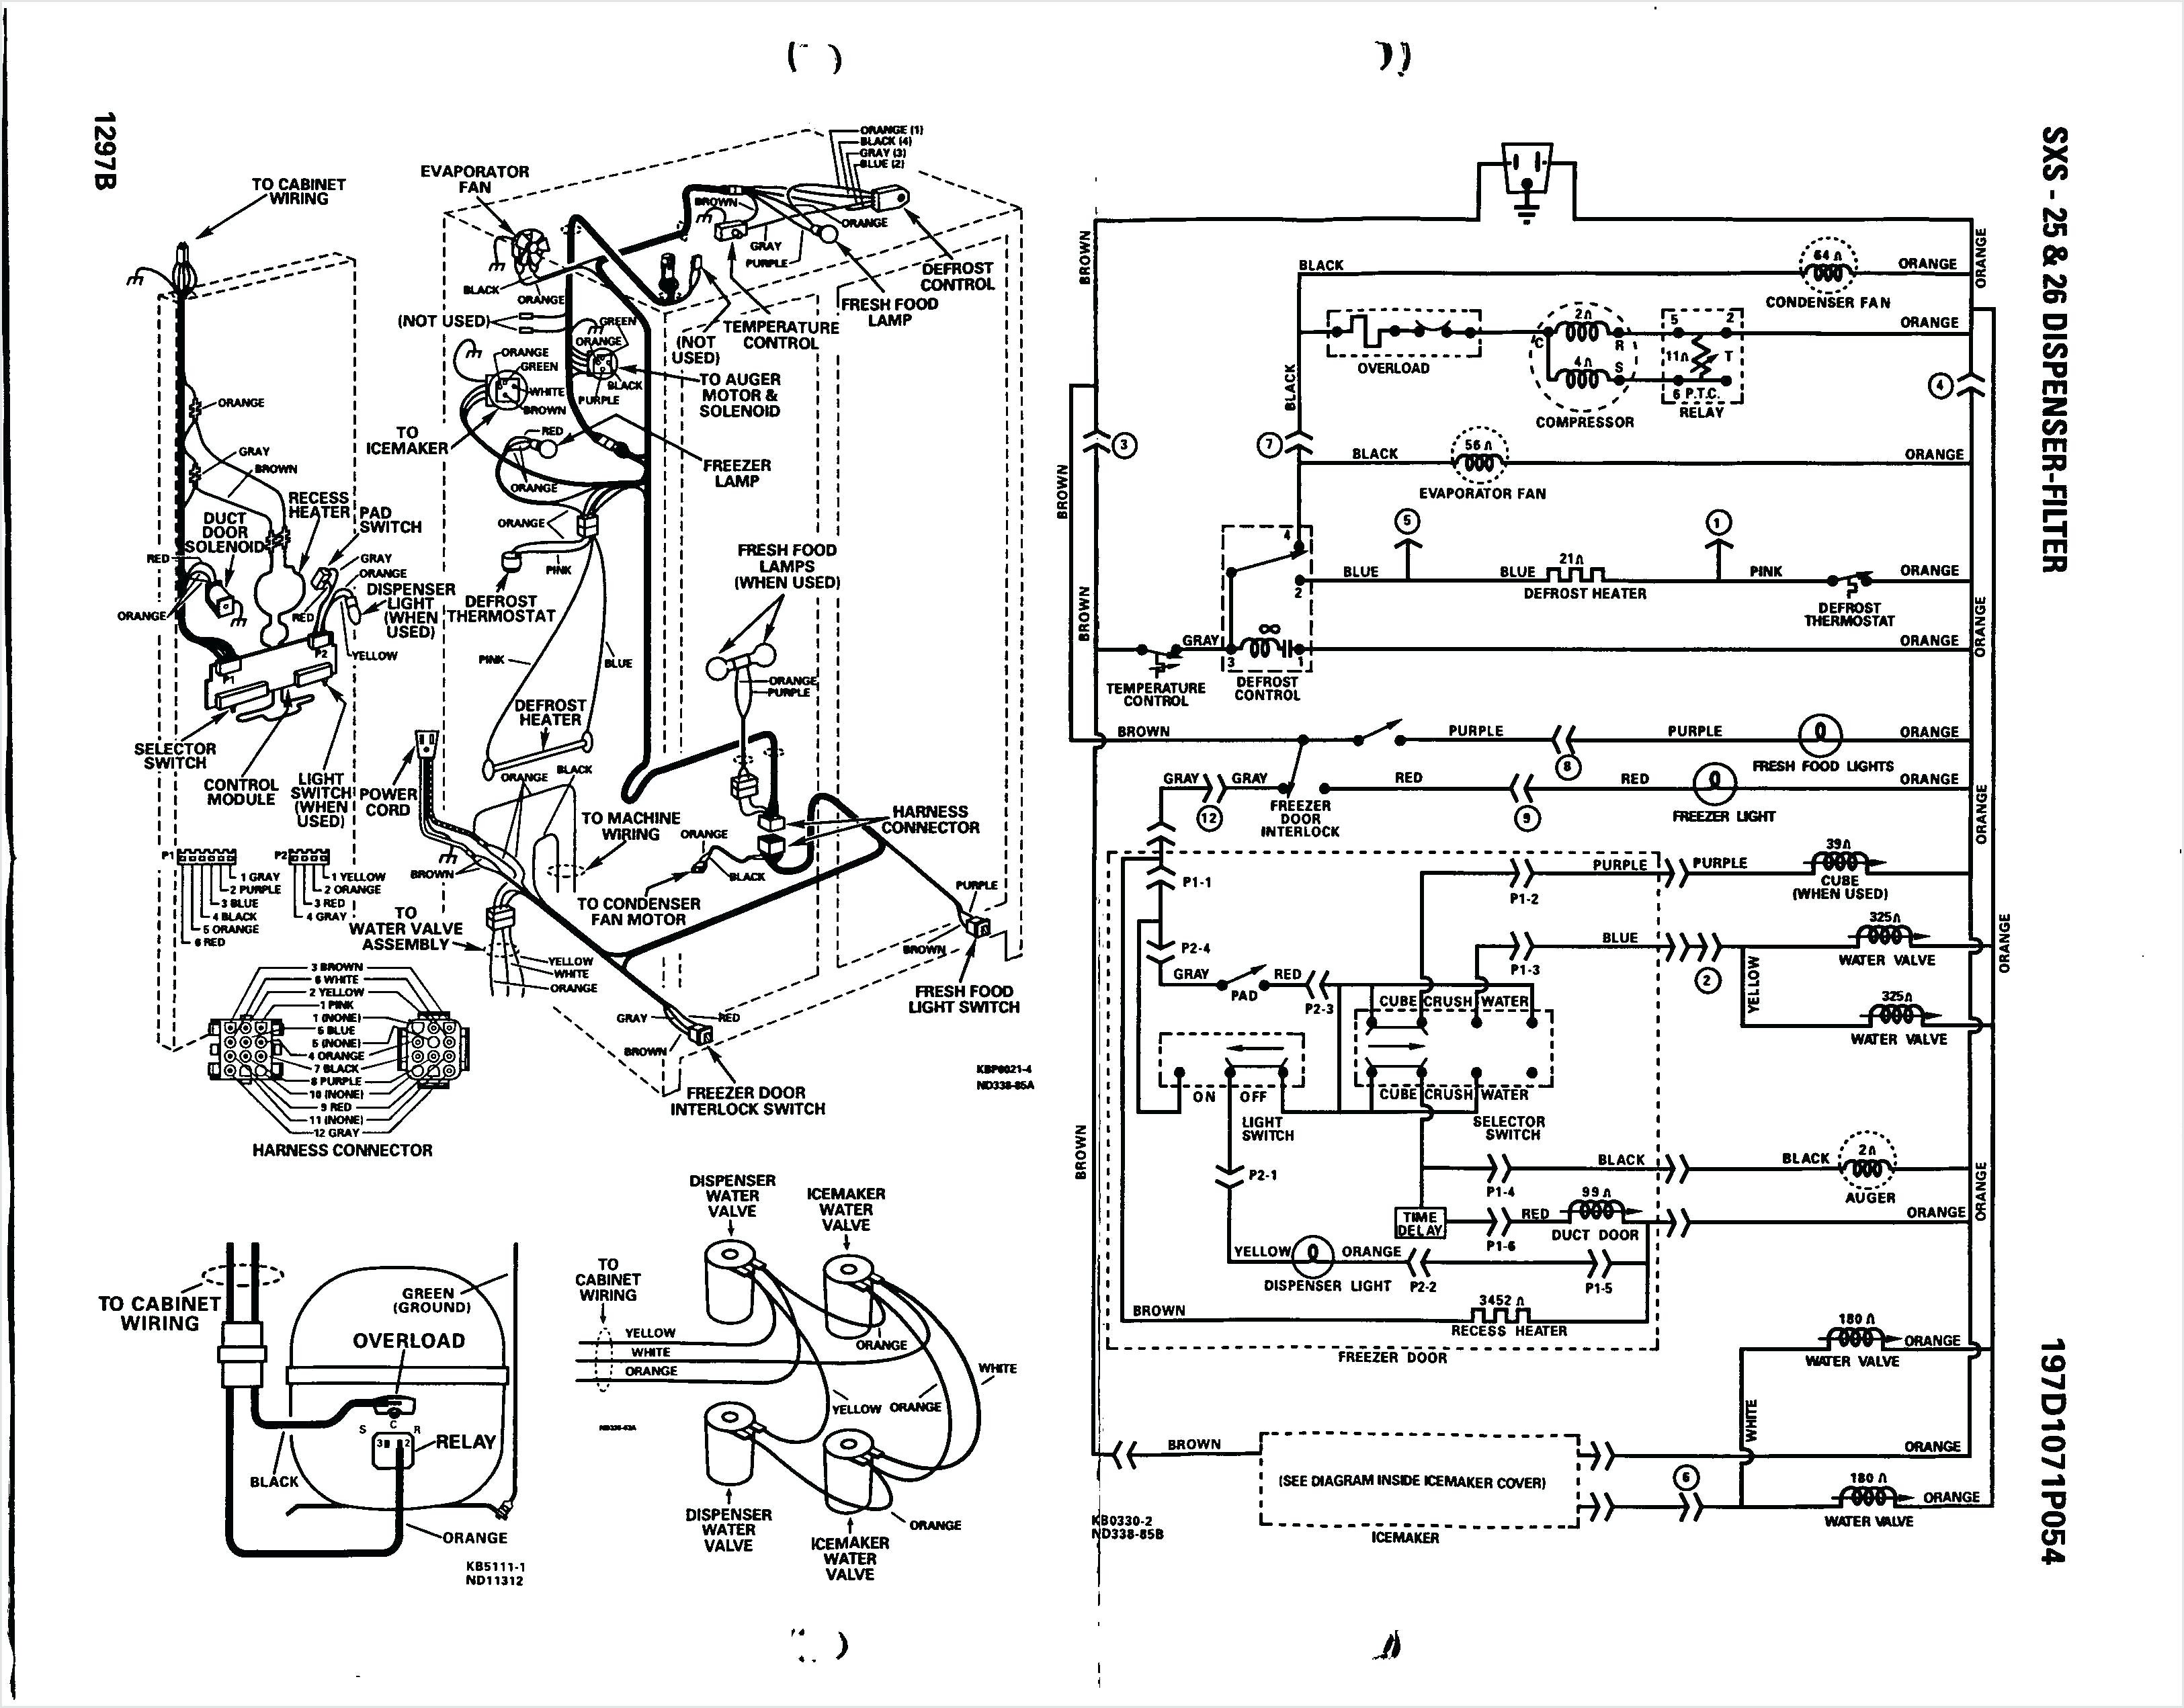 Wiring Diagram Whirlpool Dryer Dryer Wiring Diagram Whirlpool Gold Roper Free In Plug 4 Prong Of Wiring Diagram Whirlpool Dryer